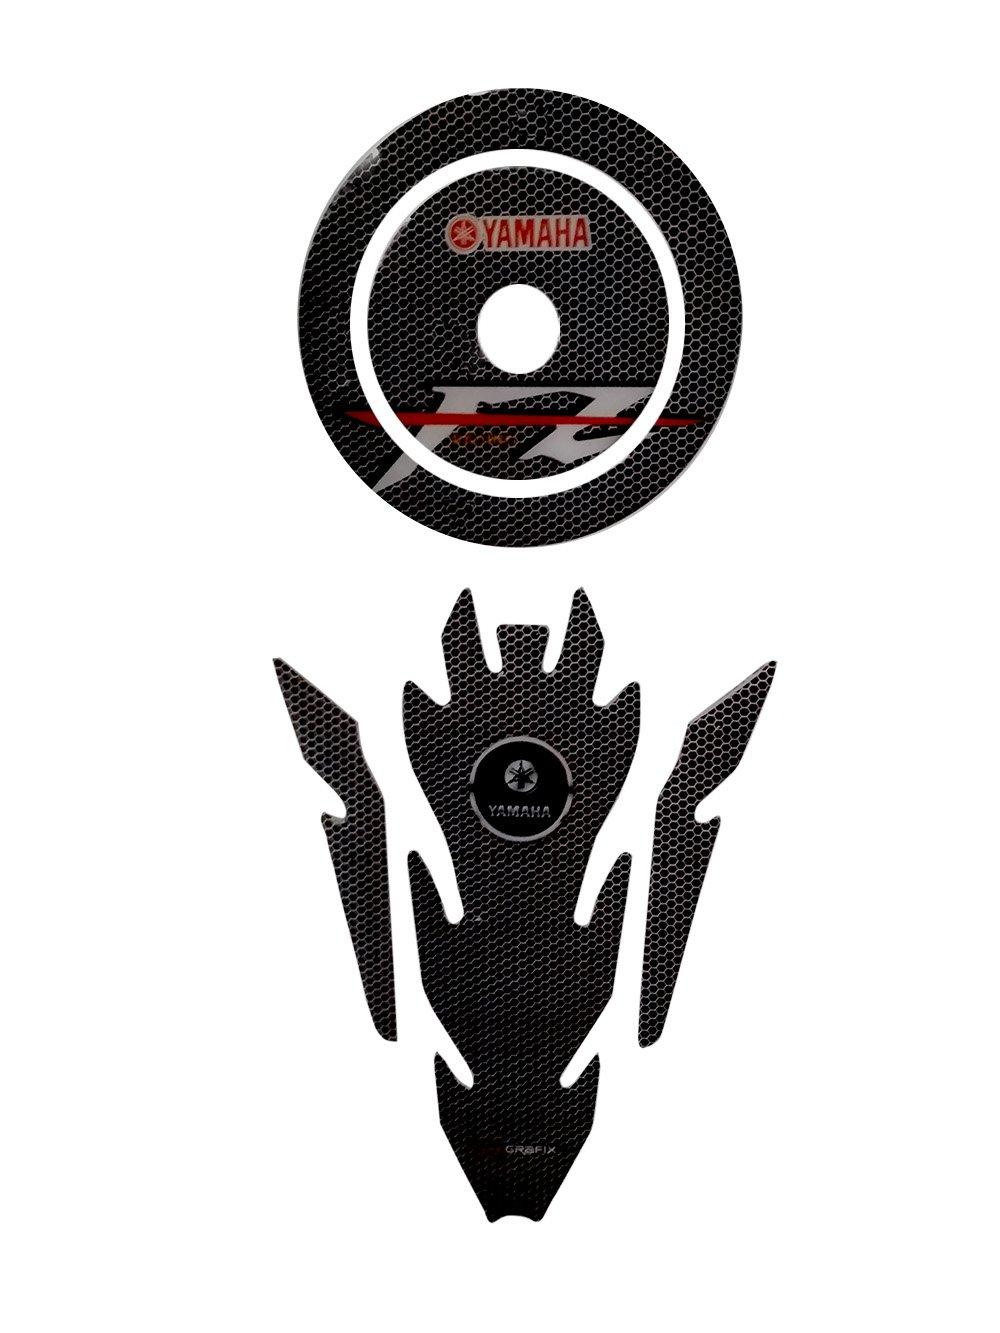 Combo fz s yamaha customize vinyl tank pad fuel cap sticker amazon in car motorbike